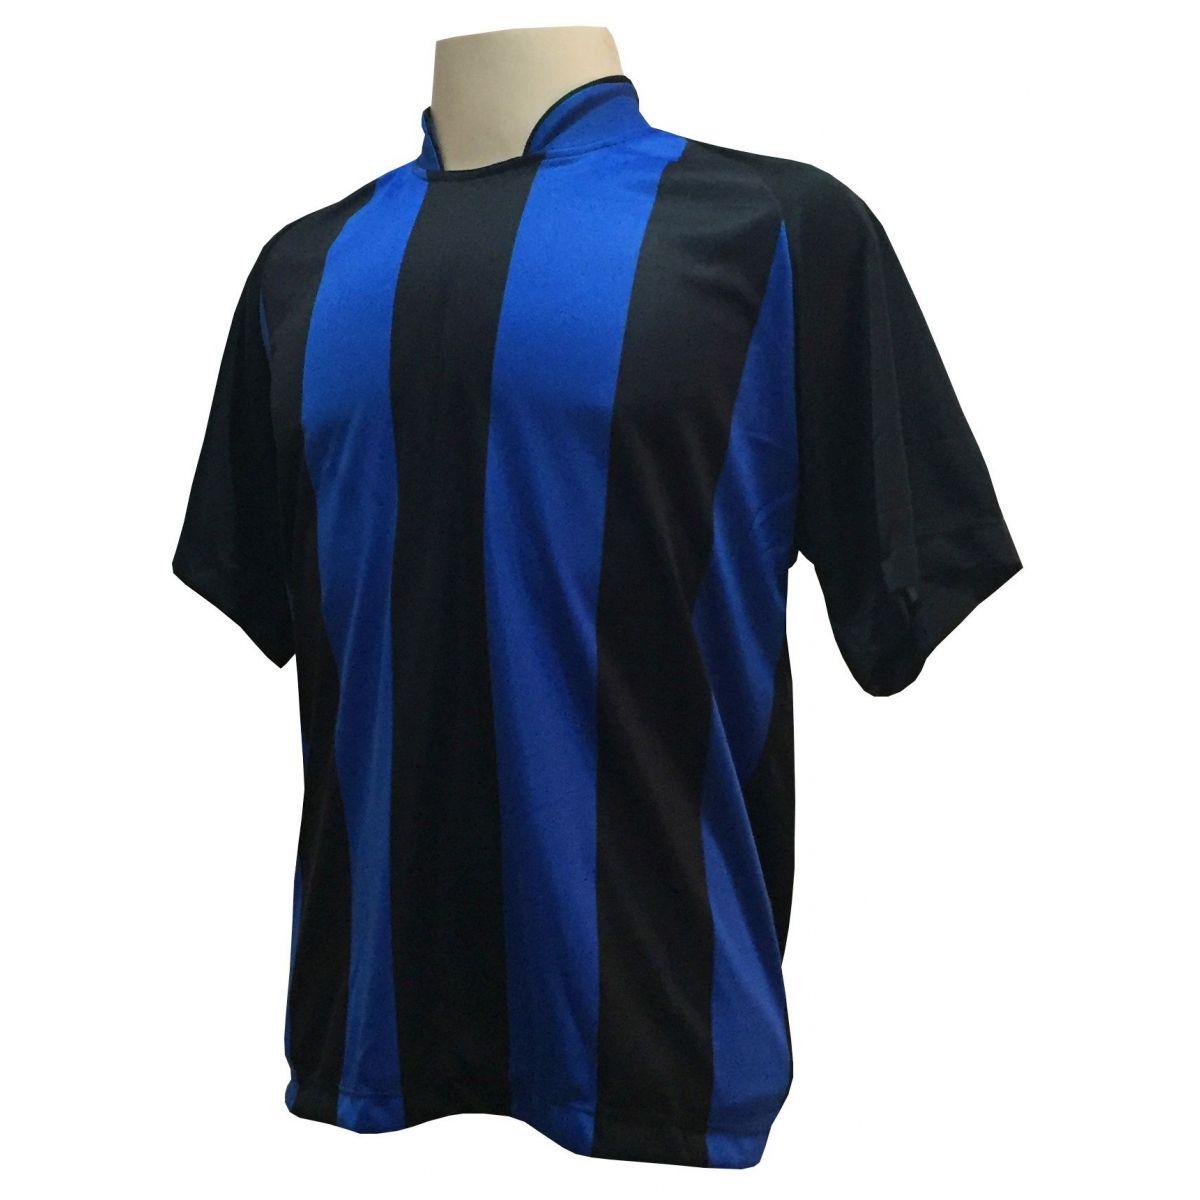 Jogo de Camisa com 20 unidades modelo Milan Preto/Royal + Brindes